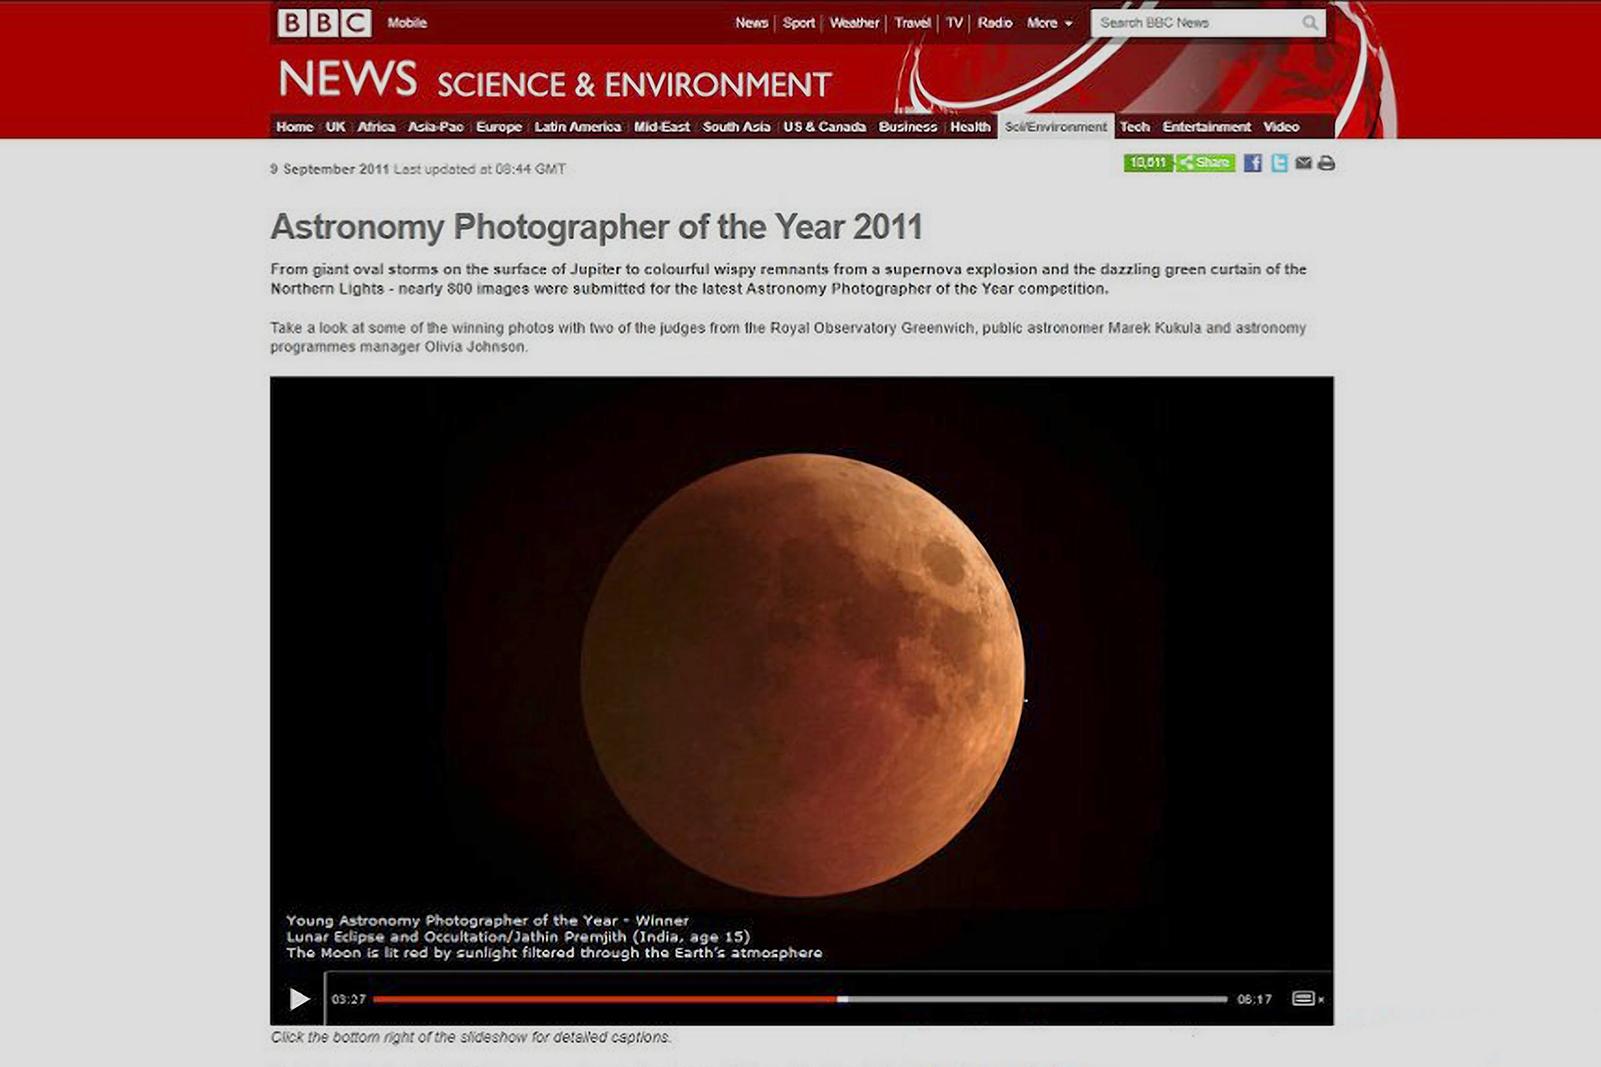 BBC -2nd Image